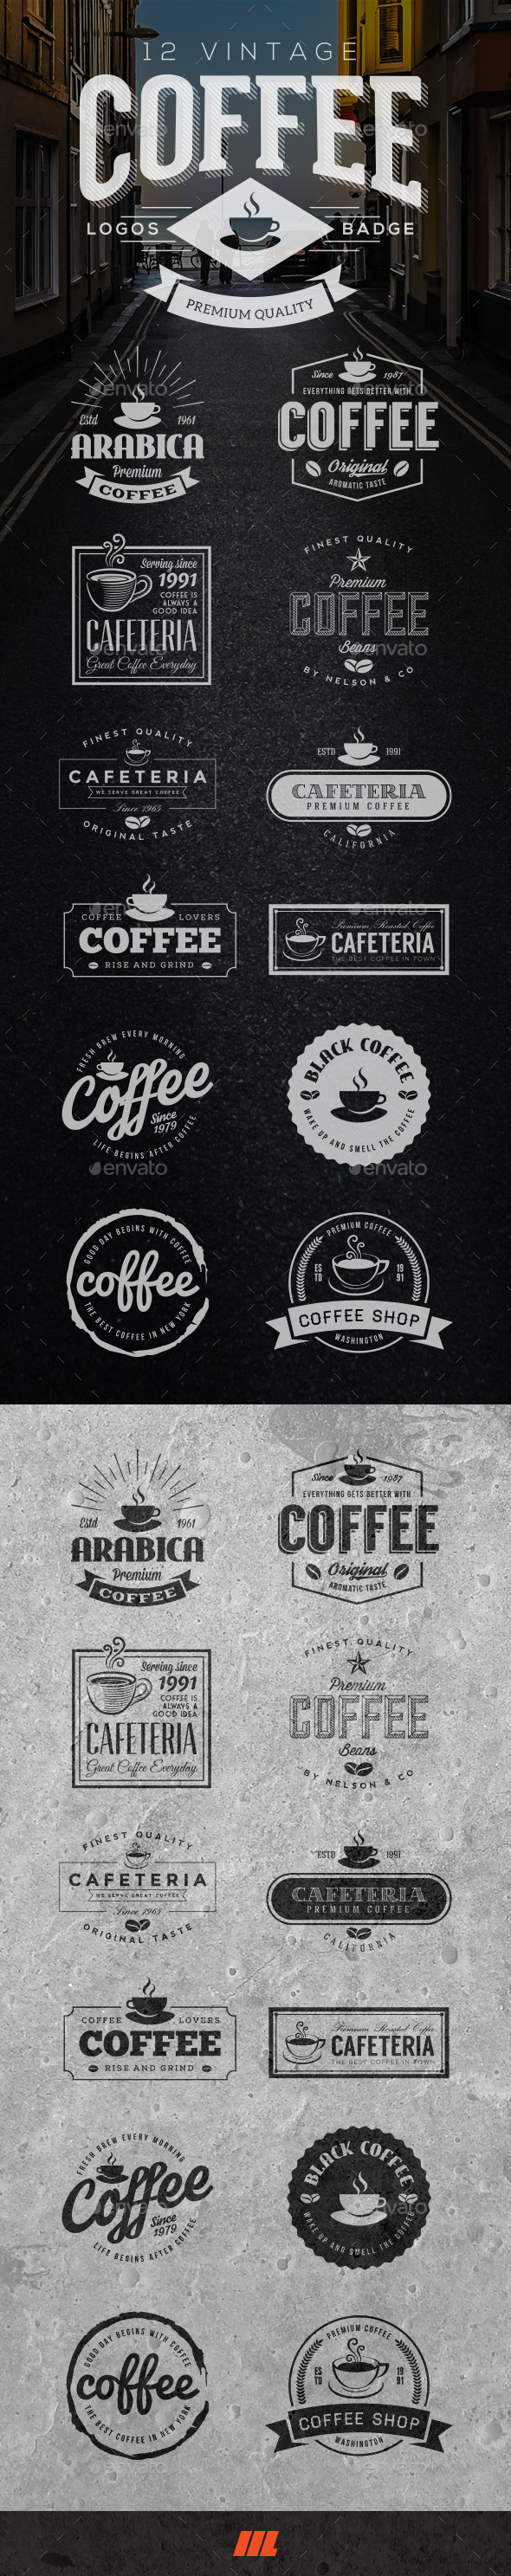 GraphicRiver 12 Retro Vintage Coffee Logo 11452453